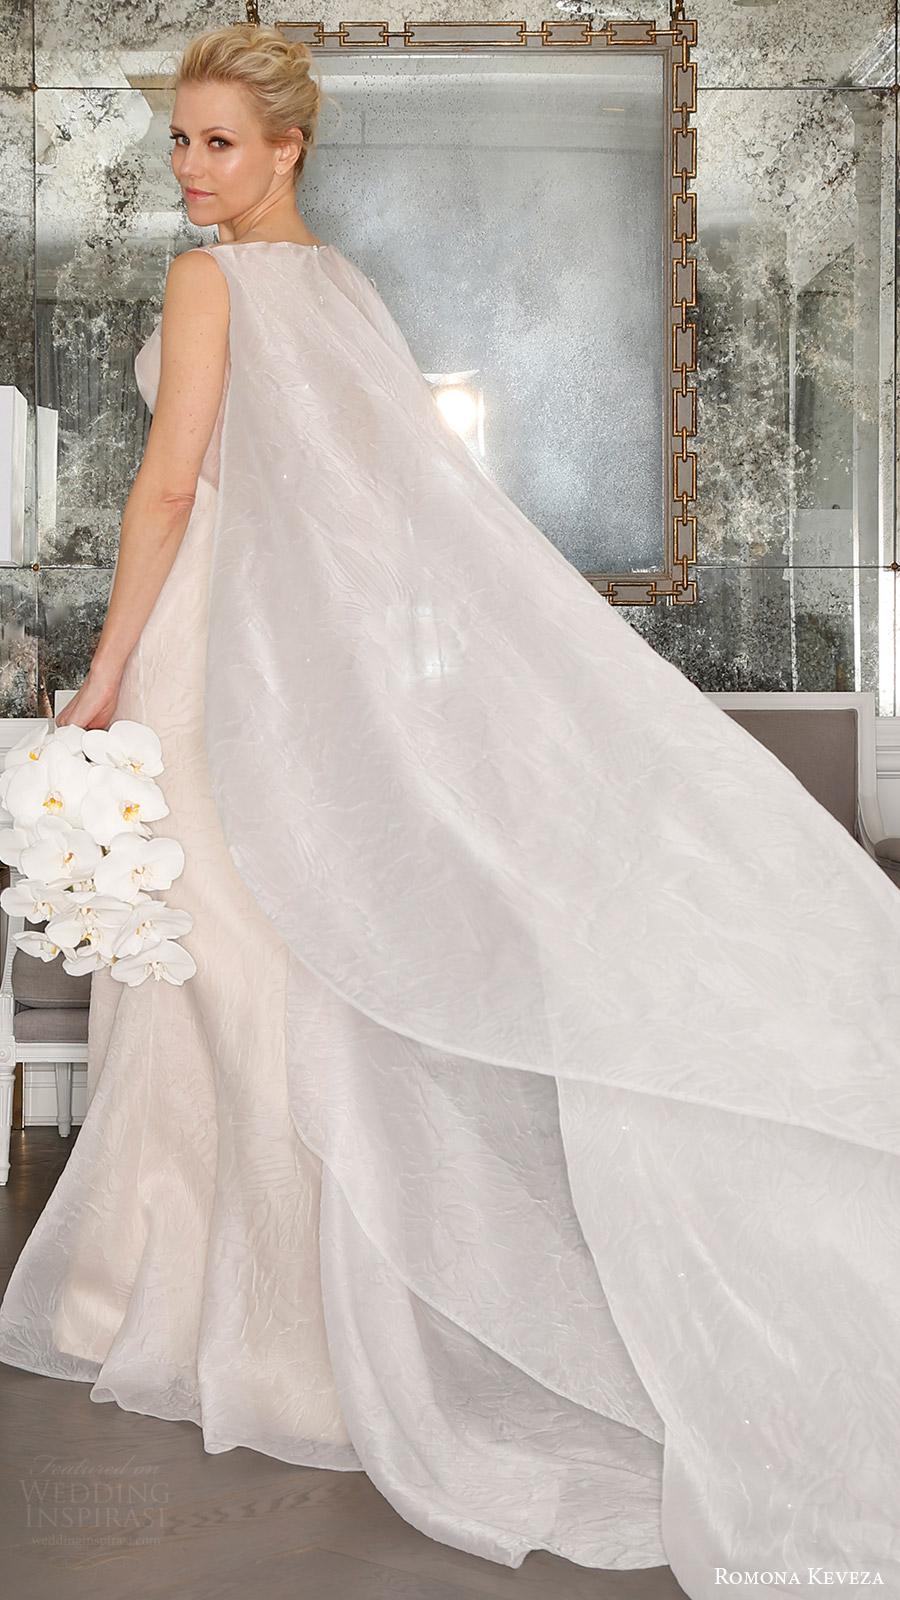 romona keveza bridal spring 2017 sleeveless sweetheart illusion bateau neck (rk7400) bv detachable watteau train